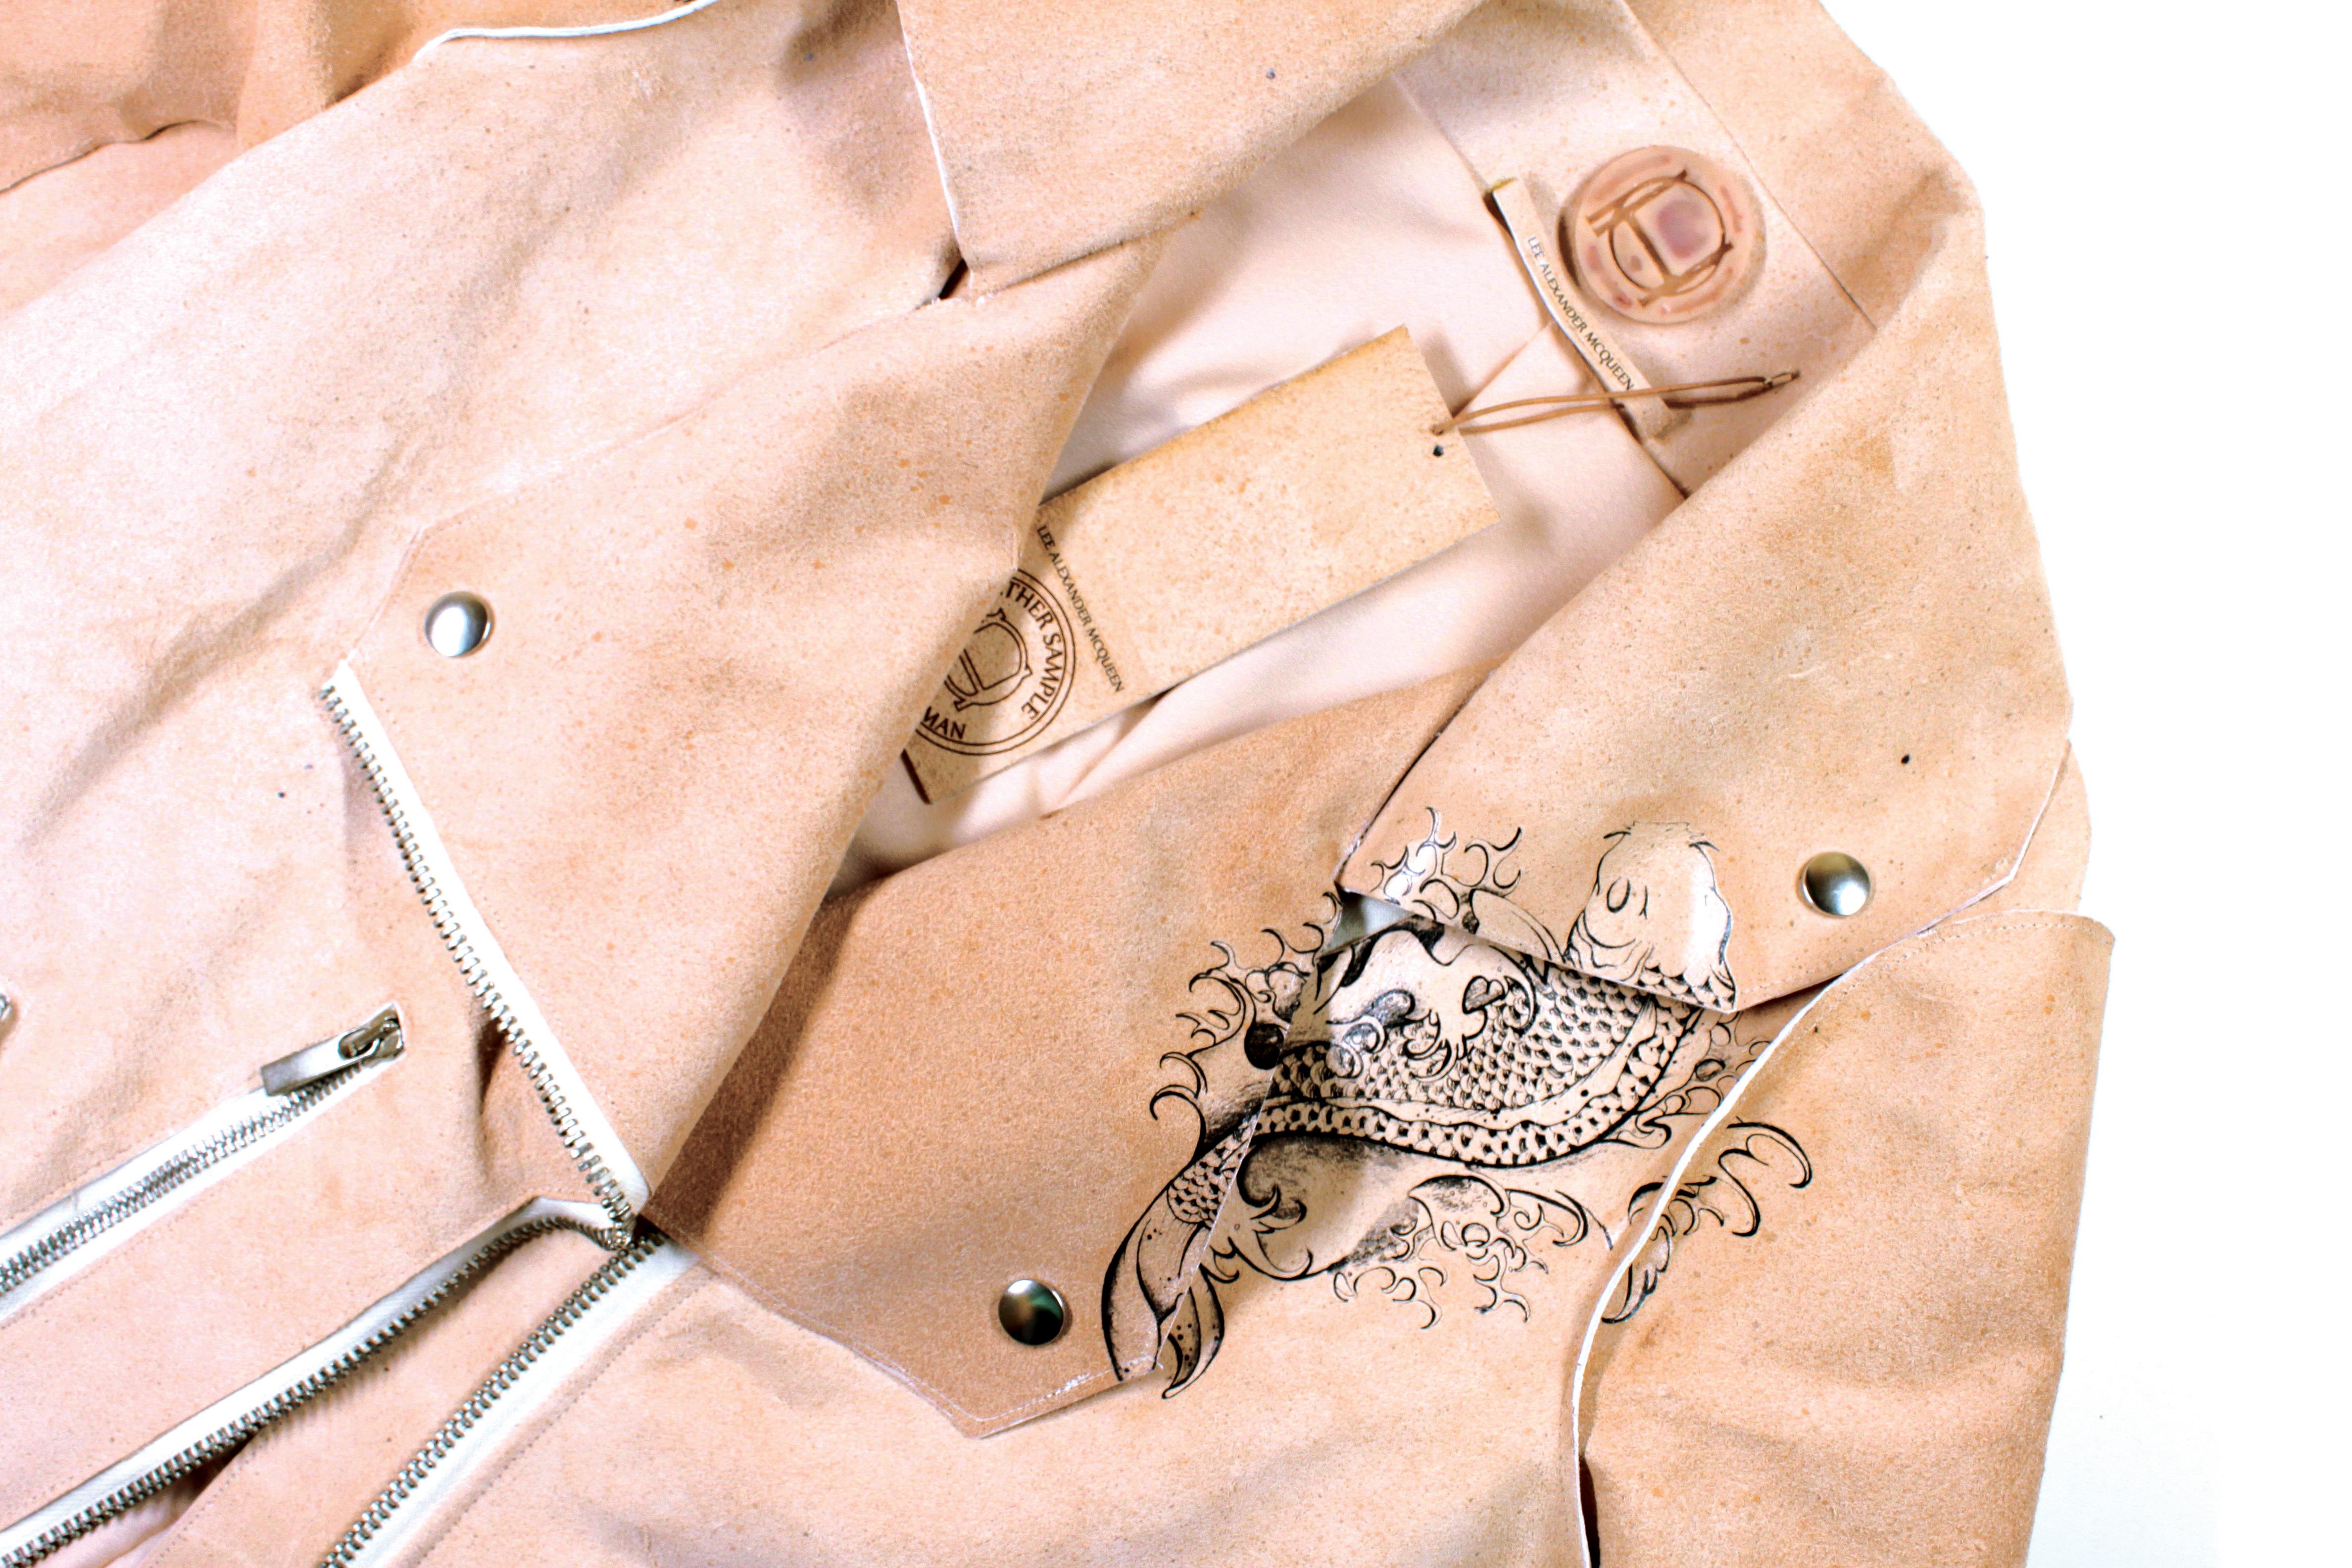 Gorjanc's McQueen jacket